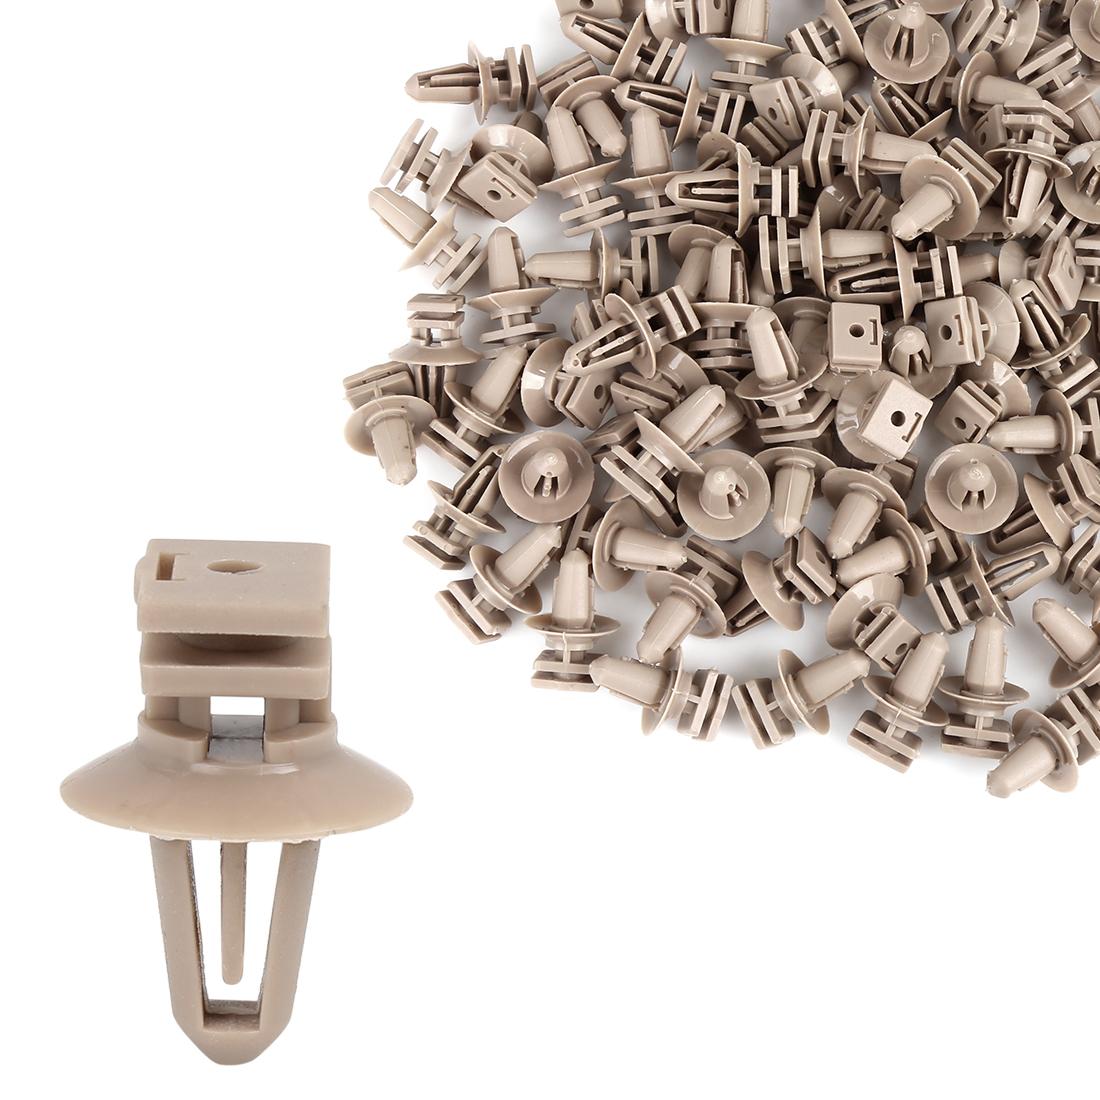 100pcs Door Entry Sill Moulding Plastic Trim Clips for BMW M4 M6 07147074343